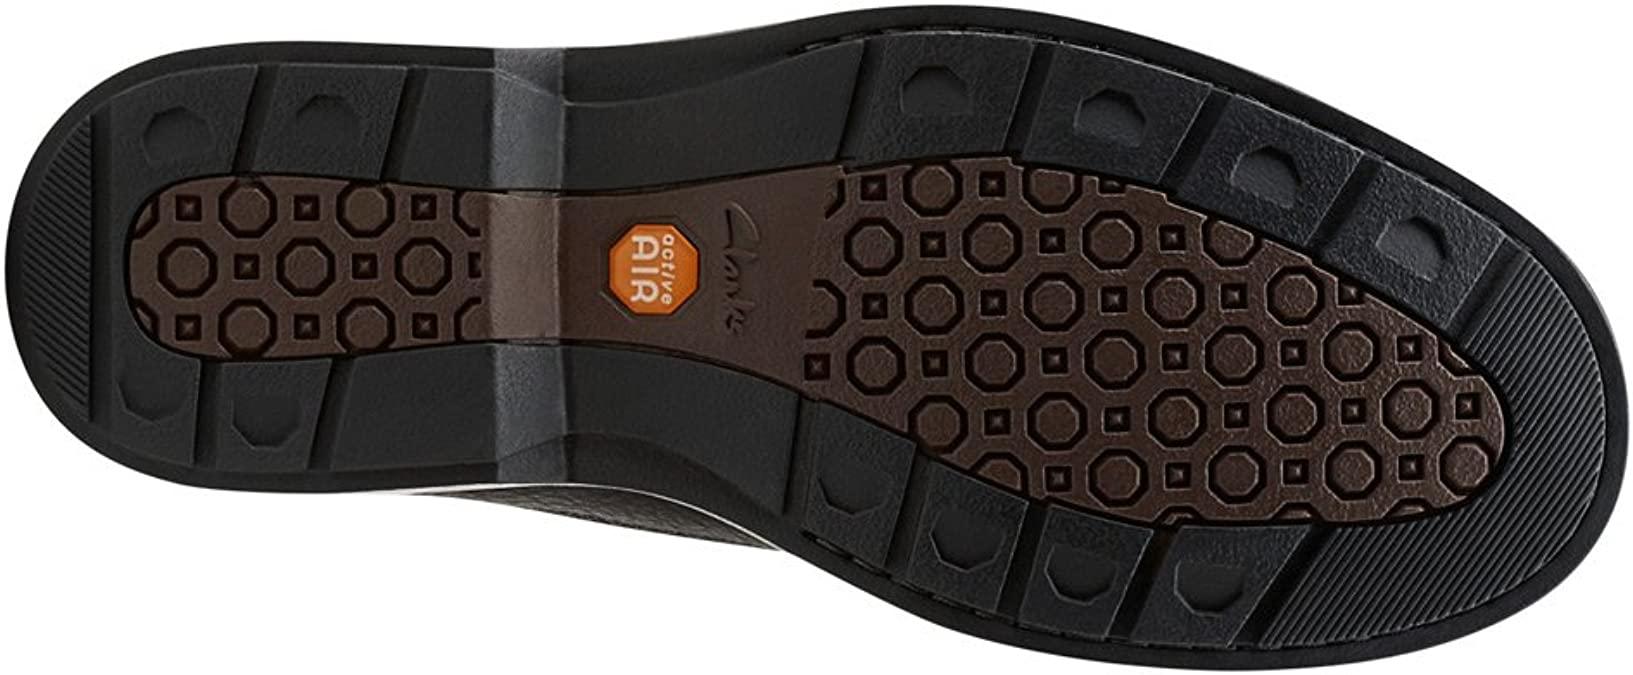 Clarks Rockie Top Gtx Boot: Amazon.co